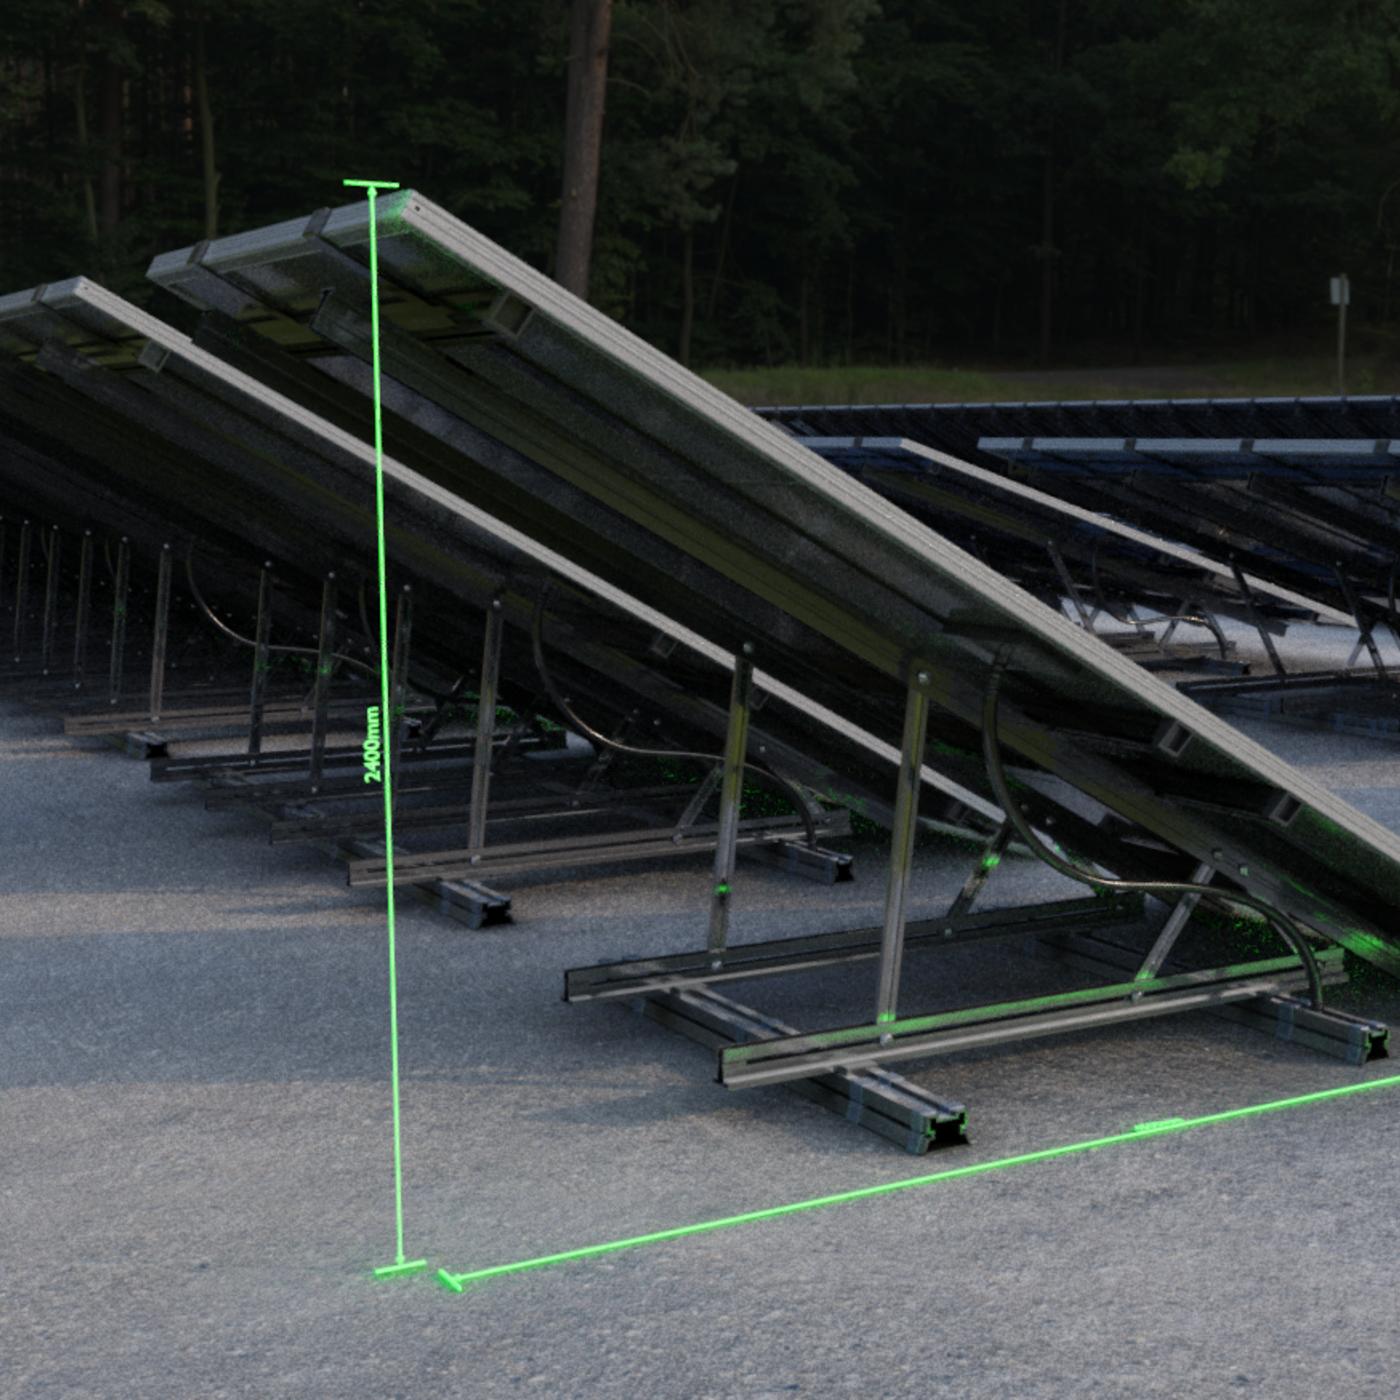 Low-Poly Solar Panels - Blender-2.93 Eevee